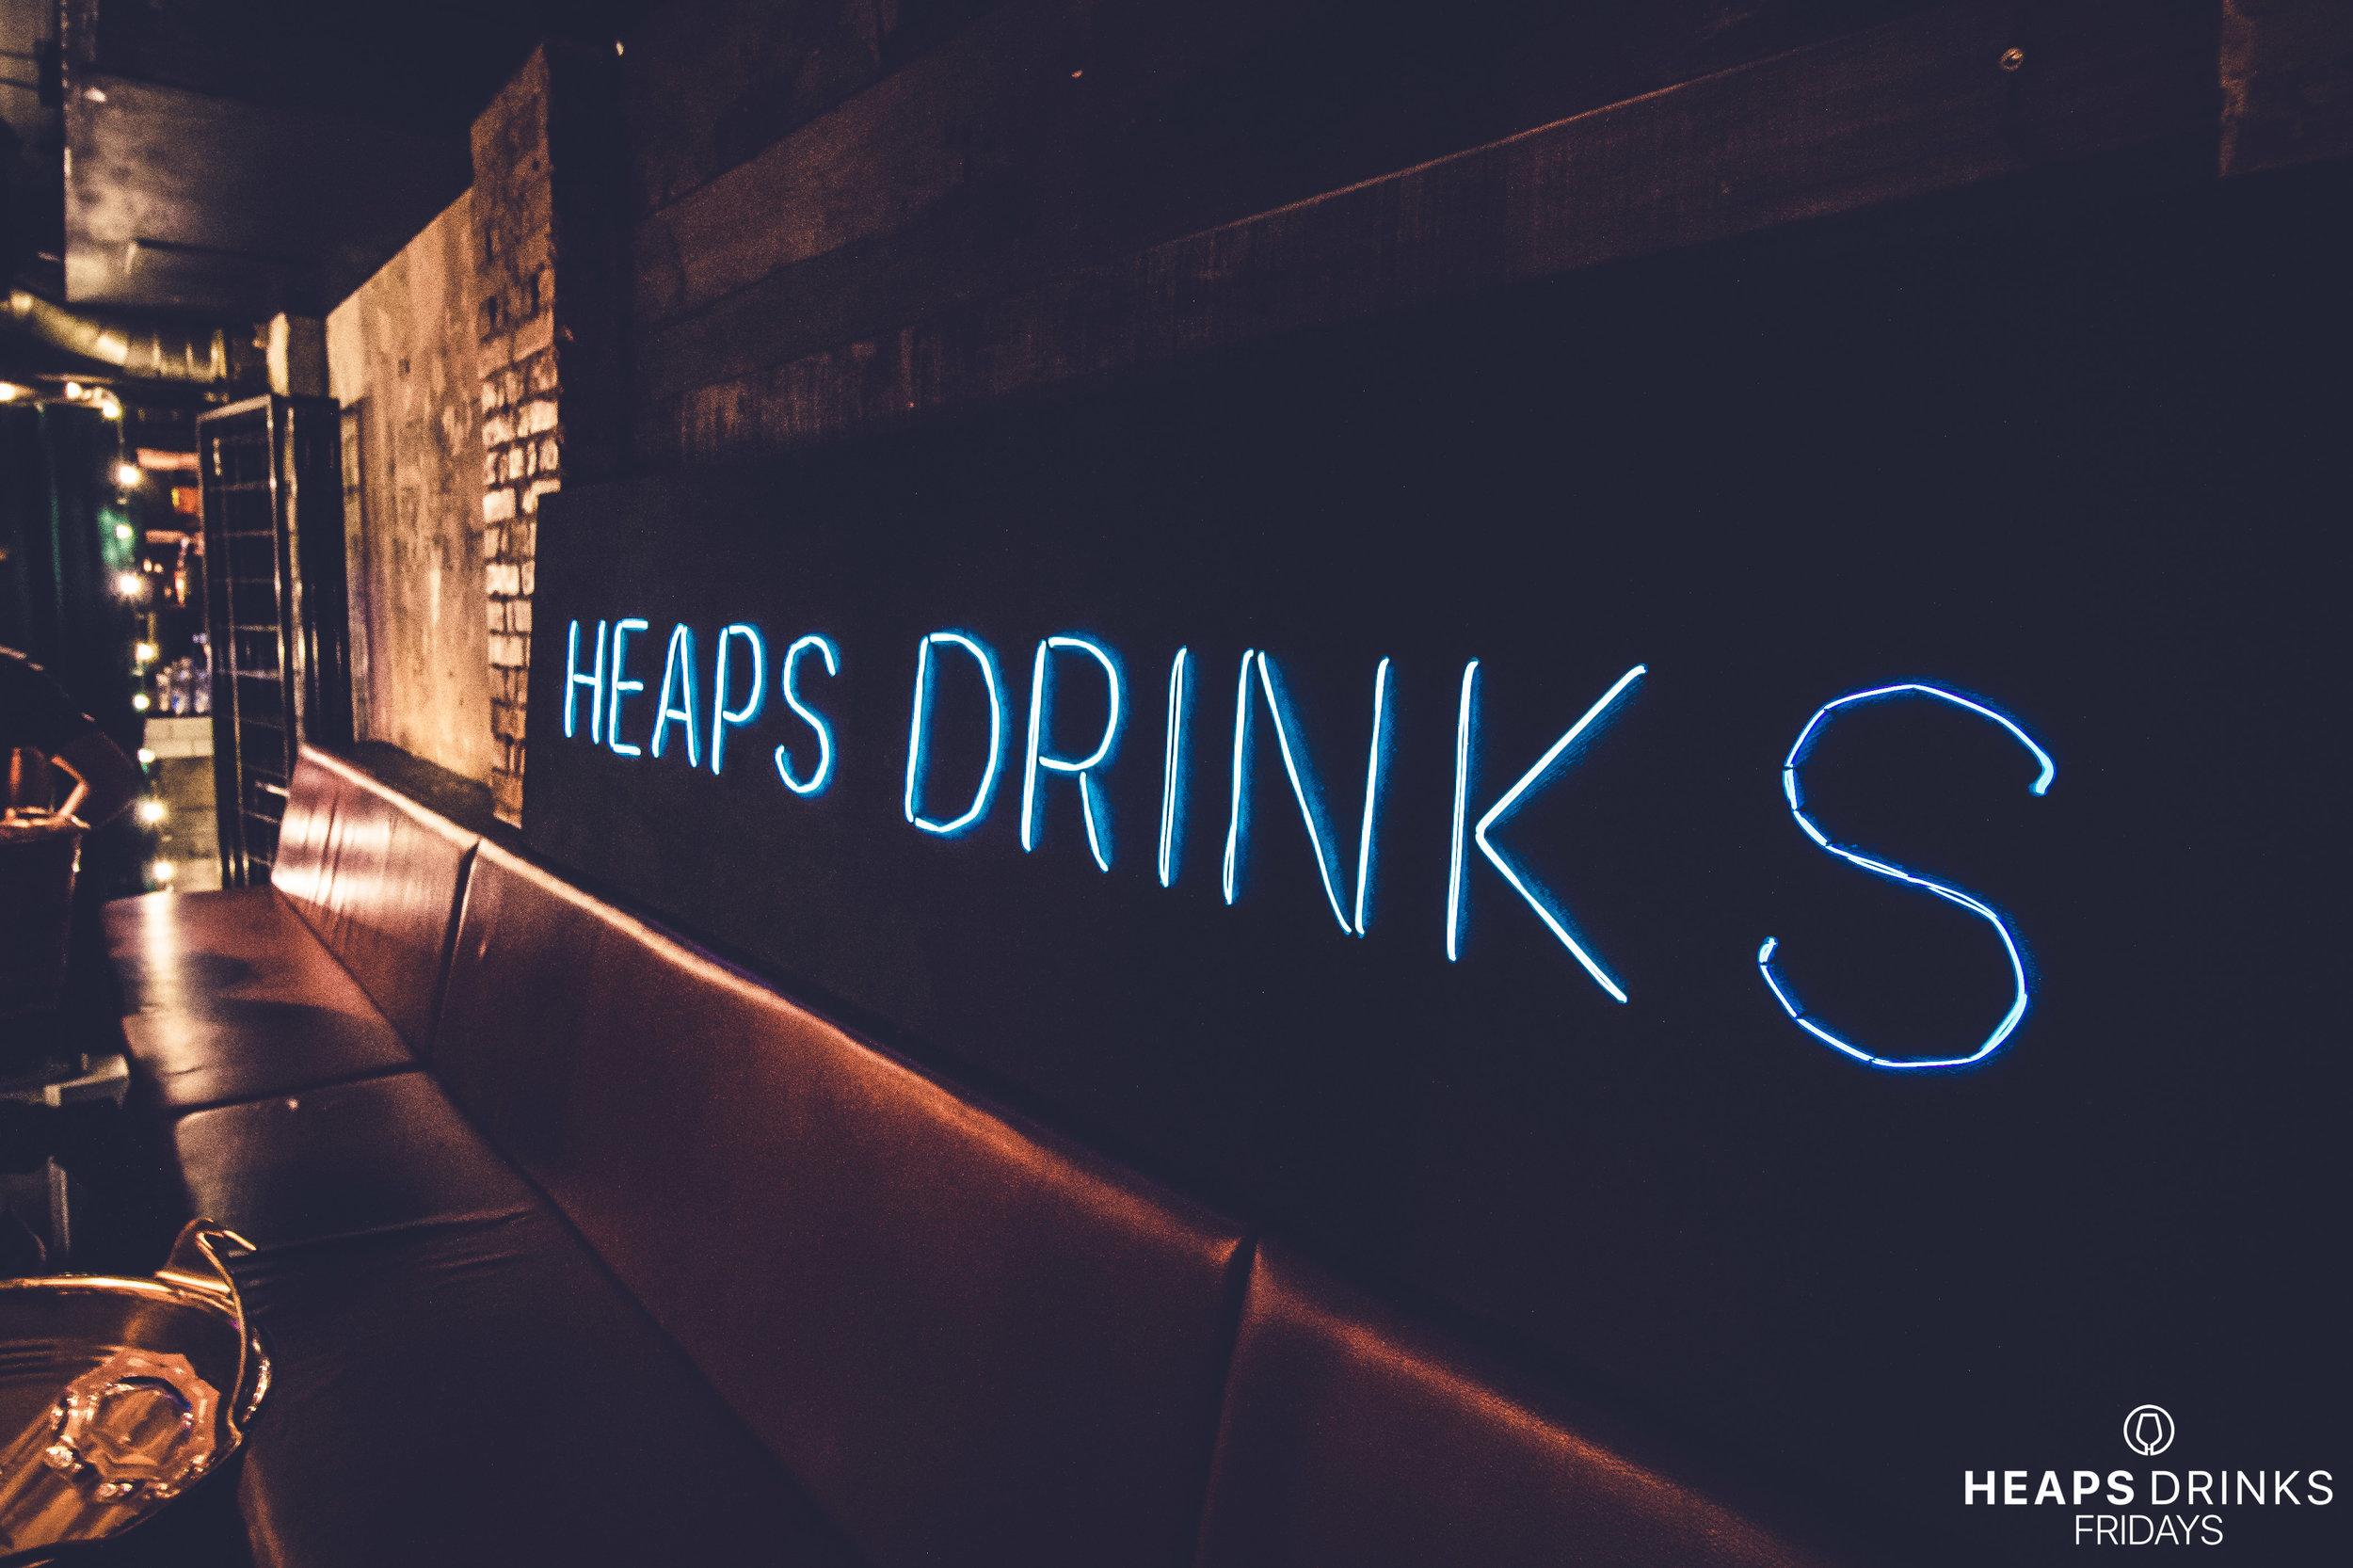 Heaps_drinks_3.jpg